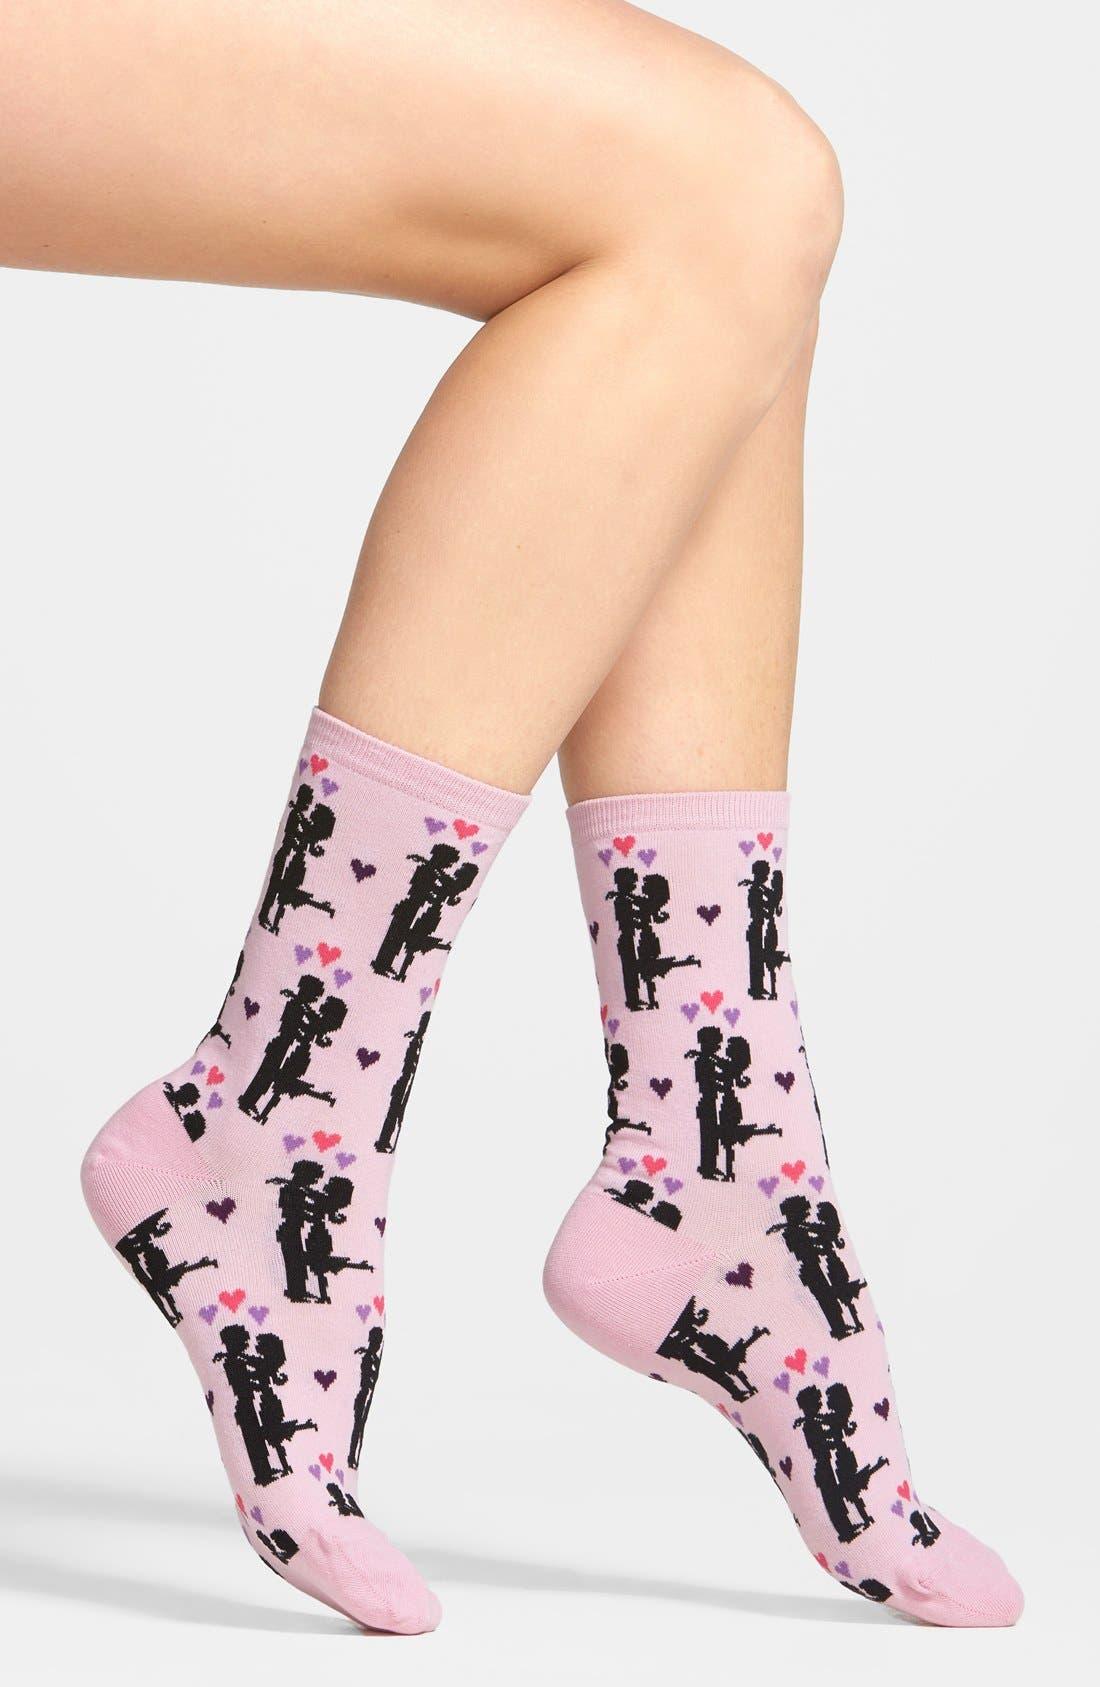 Alternate Image 1 Selected - Hot Sox 'Happy Couple' Socks